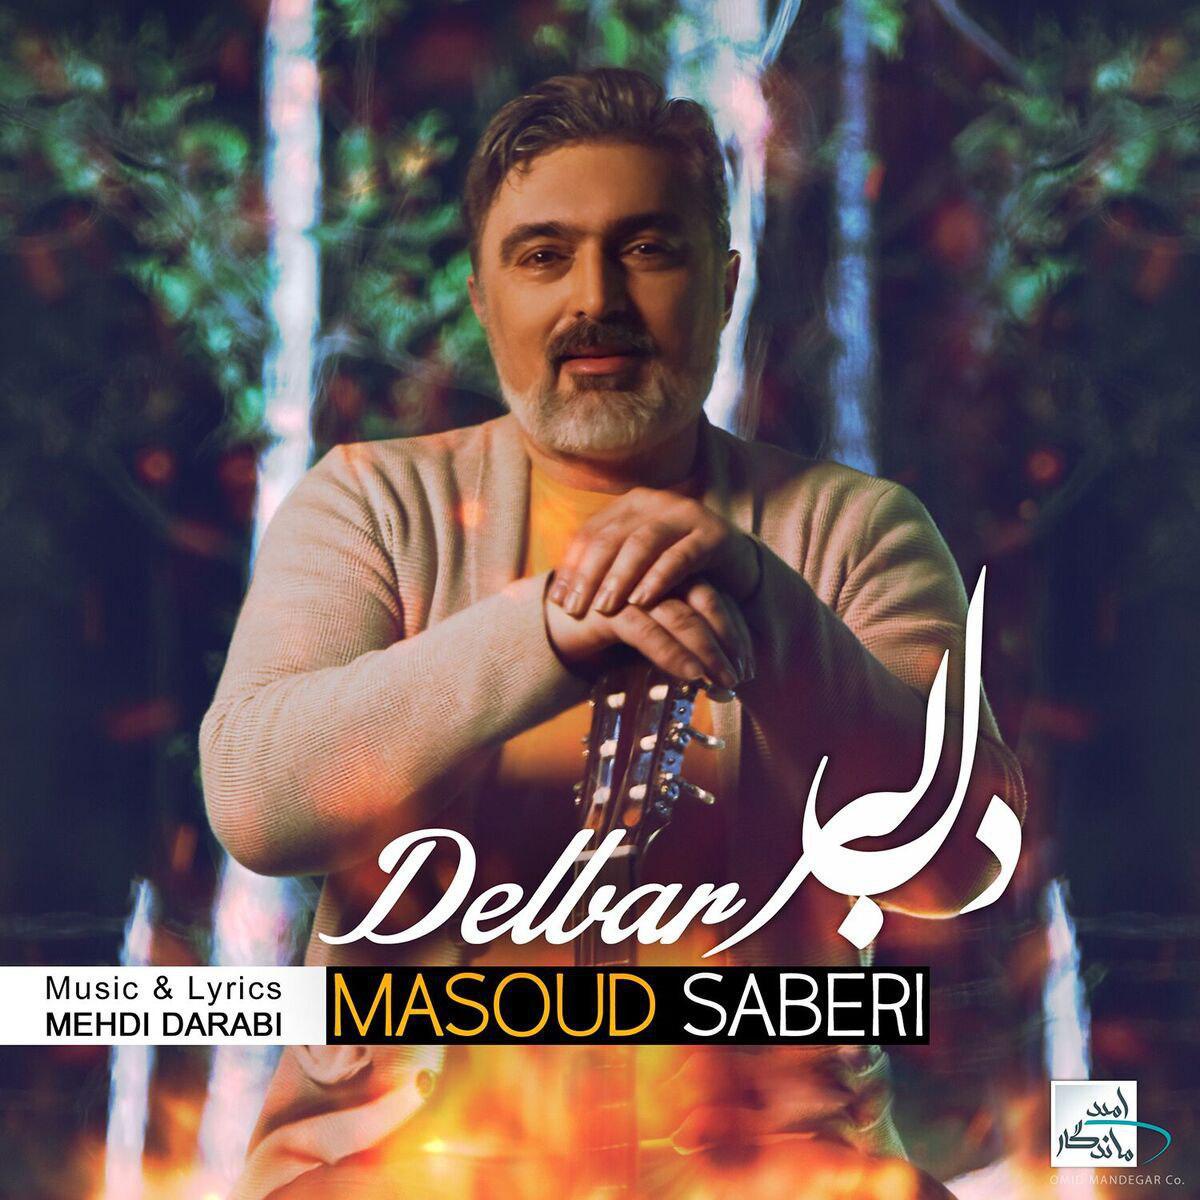 Masoud Saberi - Delbar